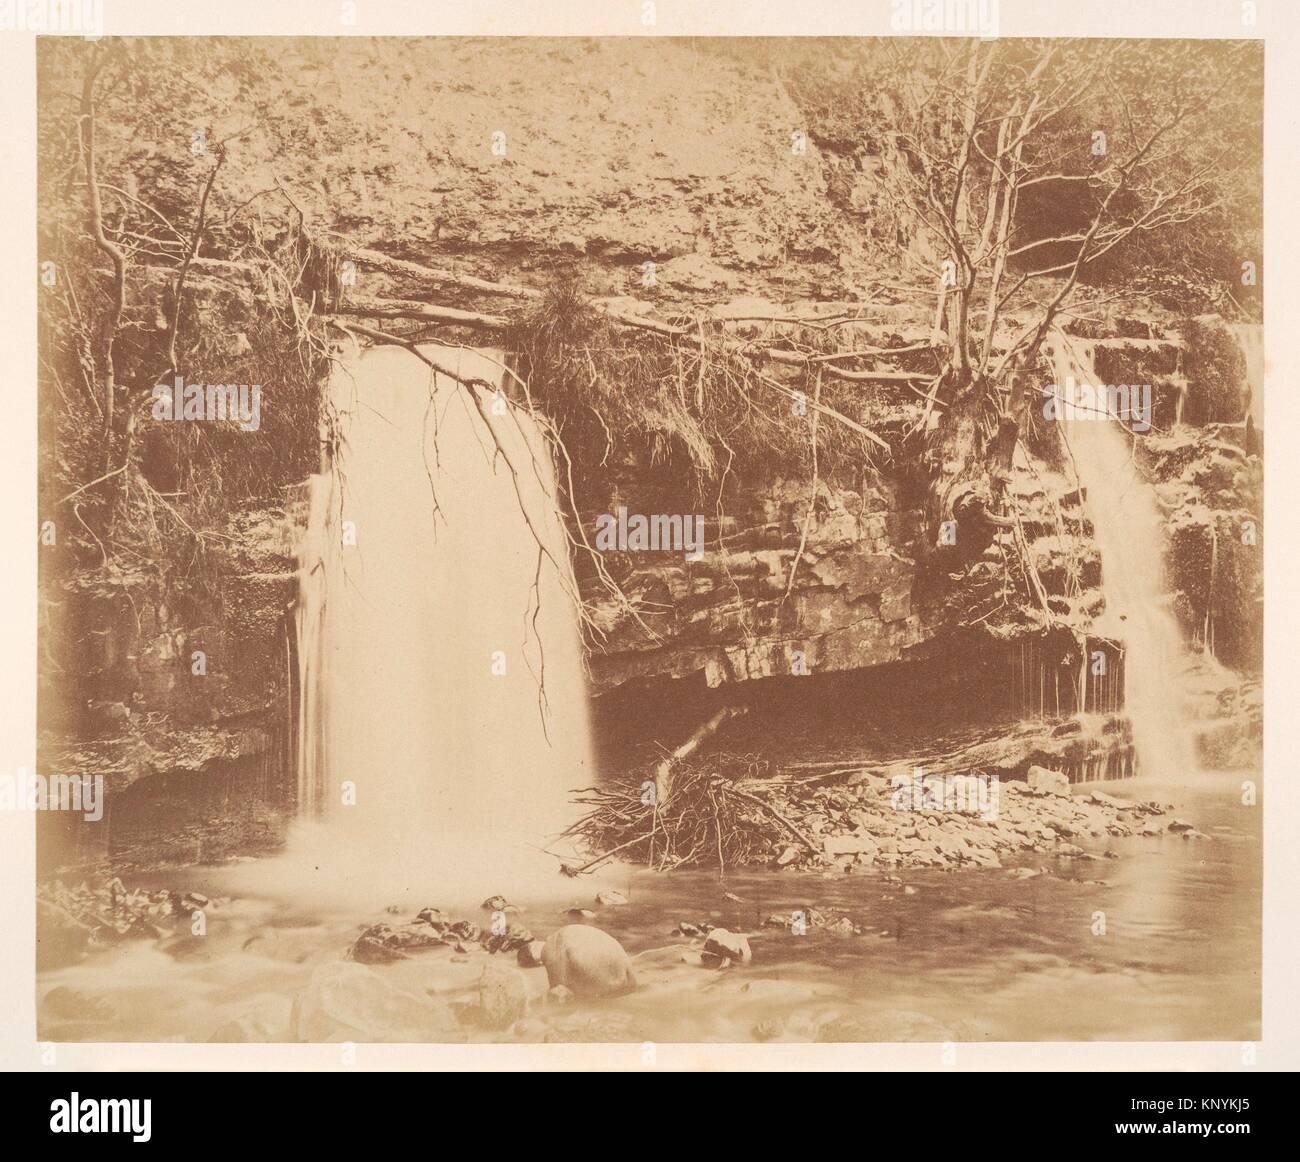 The Lower Fall. Artist: G. B. Gething (British); Date: 1856; Medium: Albumen silver print; Classification: Photographs; - Stock Image